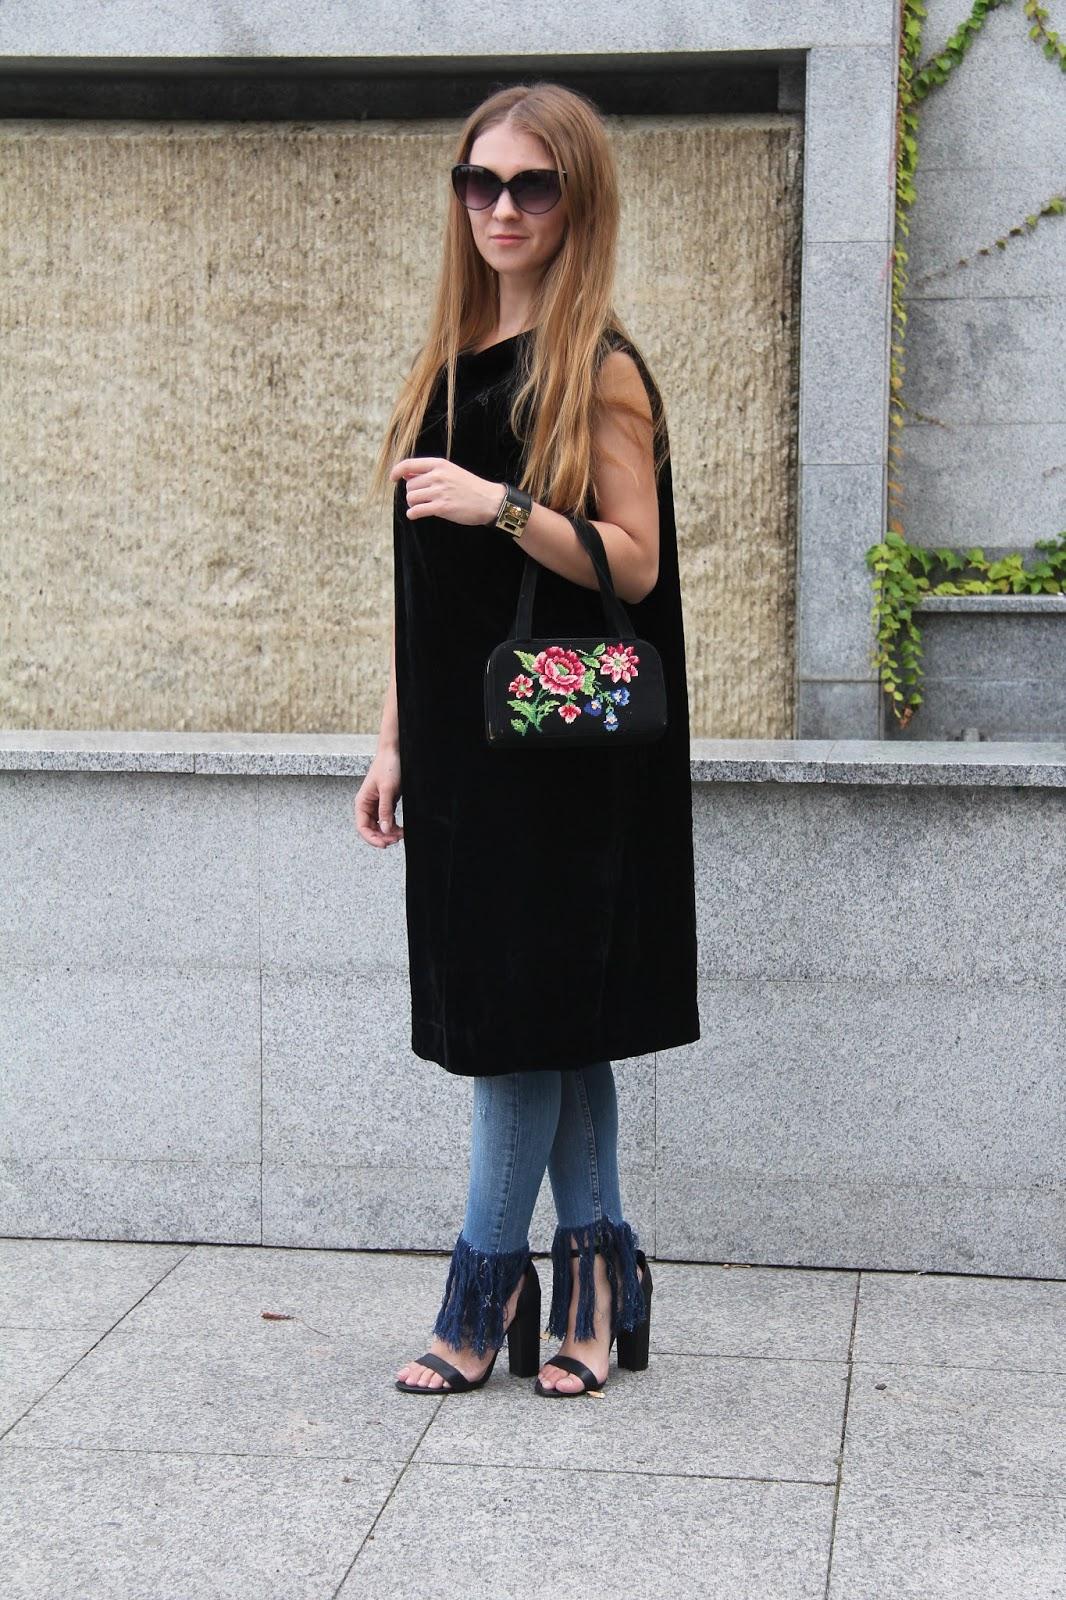 velvet vintage dress and jeans